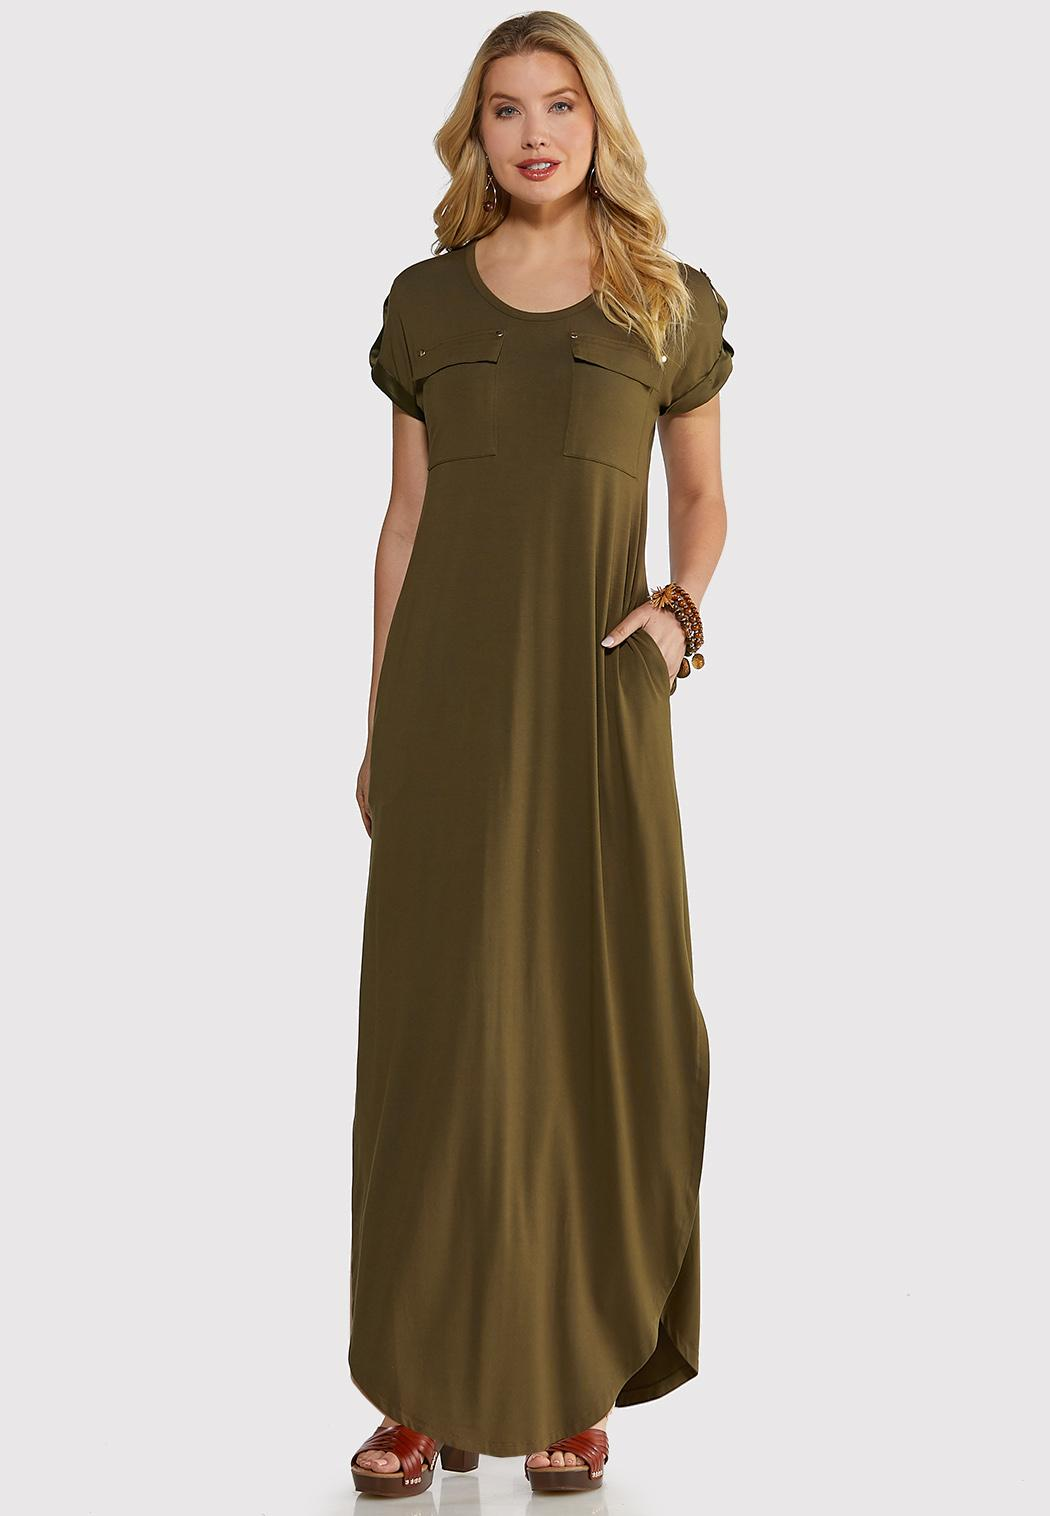 Plus Size Cute Tee Maxi Dress